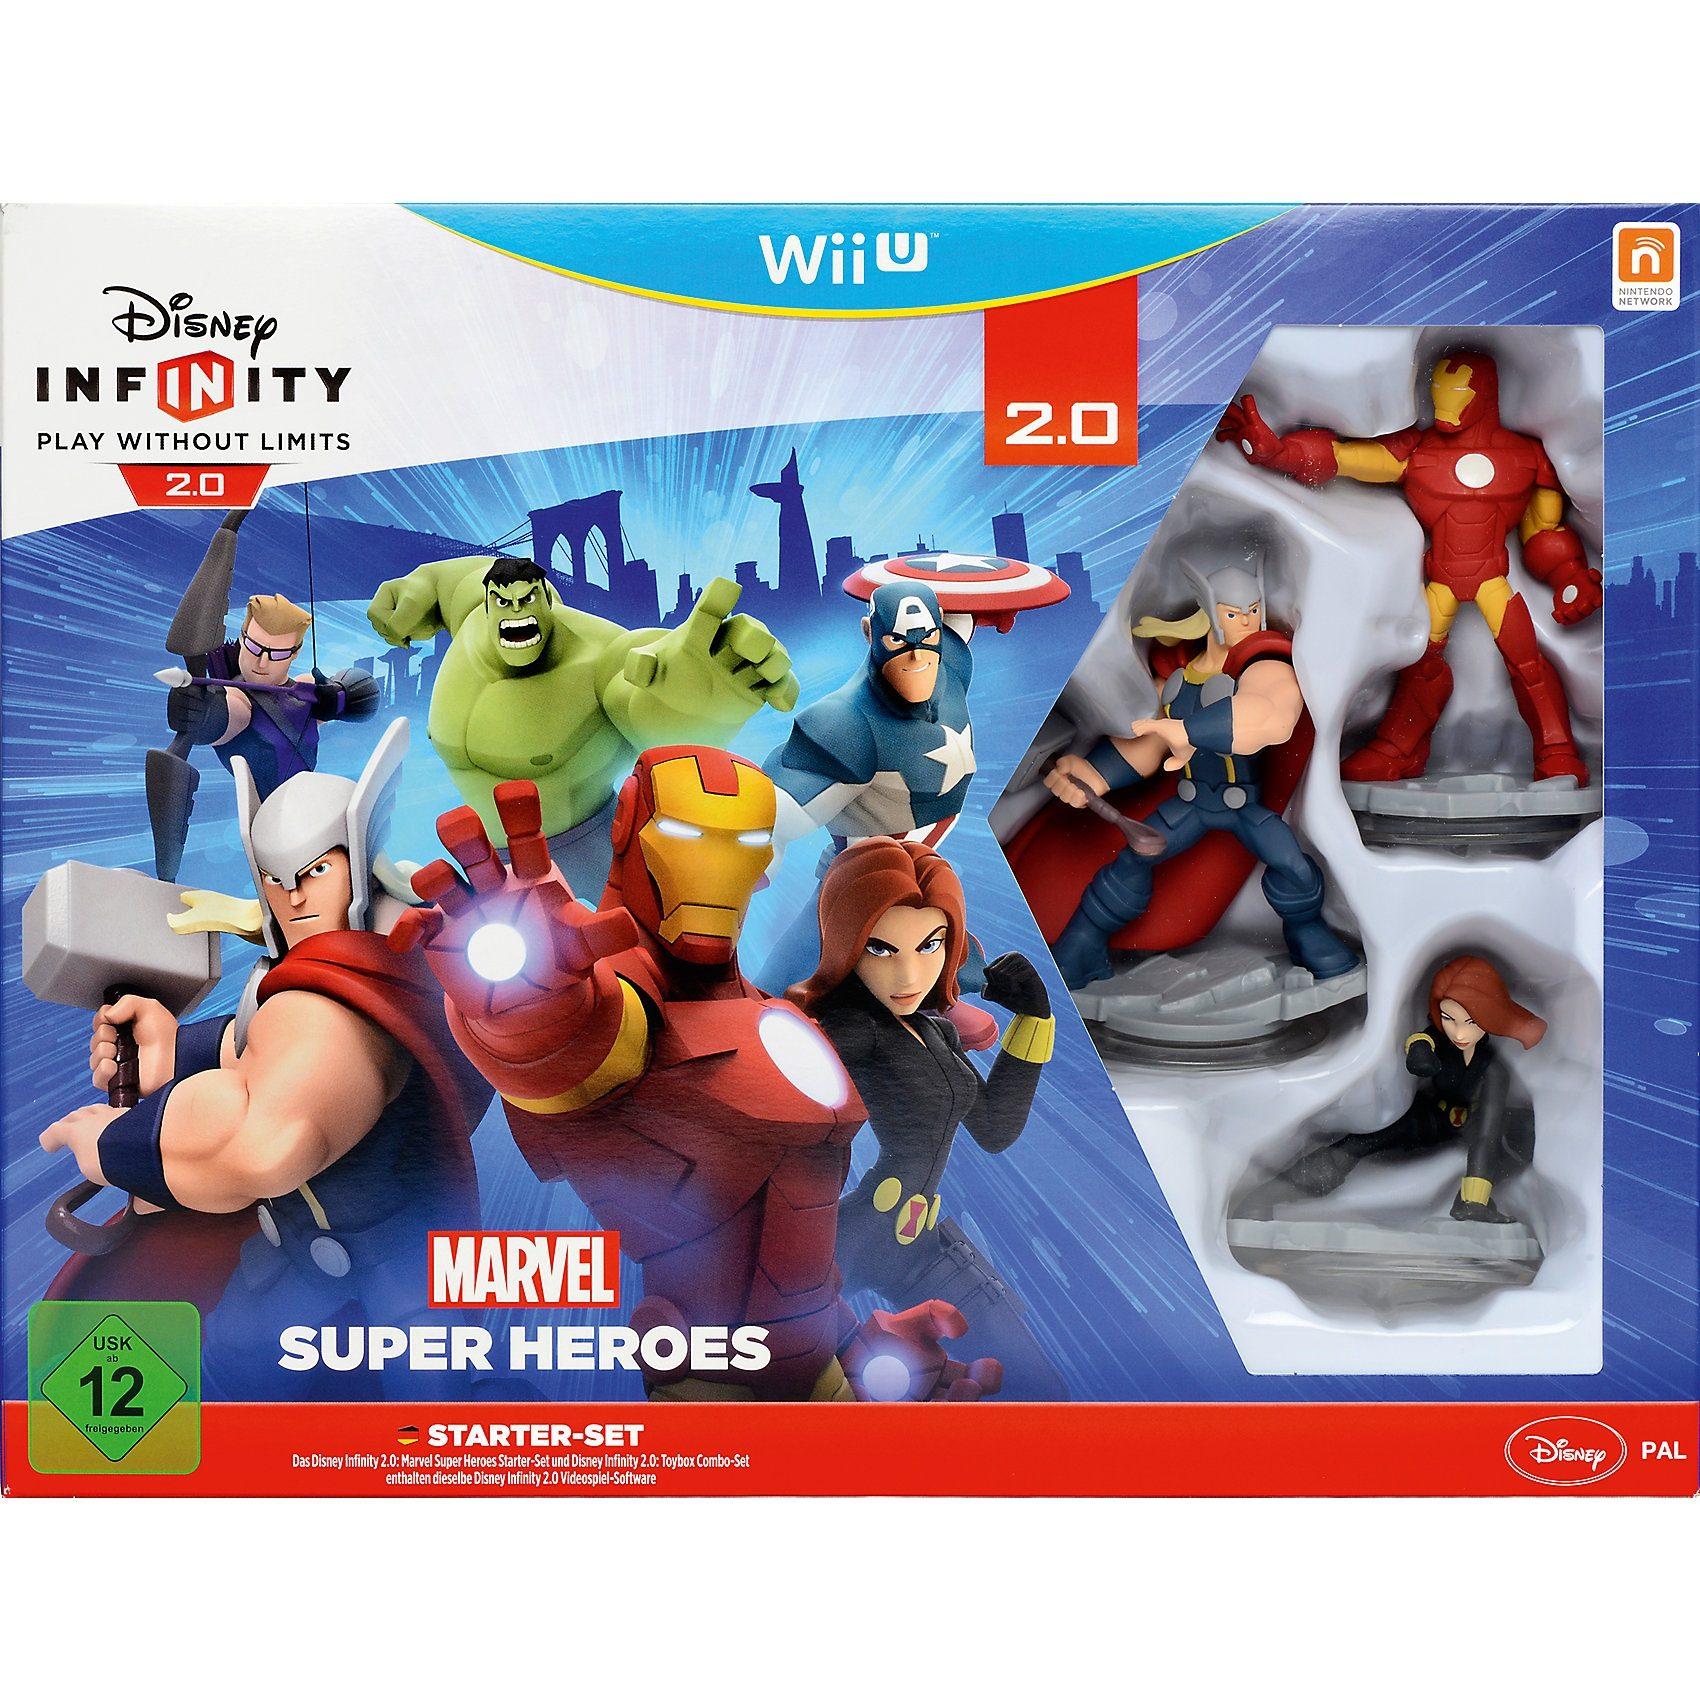 ak tronic Wii U Disney Infinity 2.0 Marvel Super Heroes Starter Set